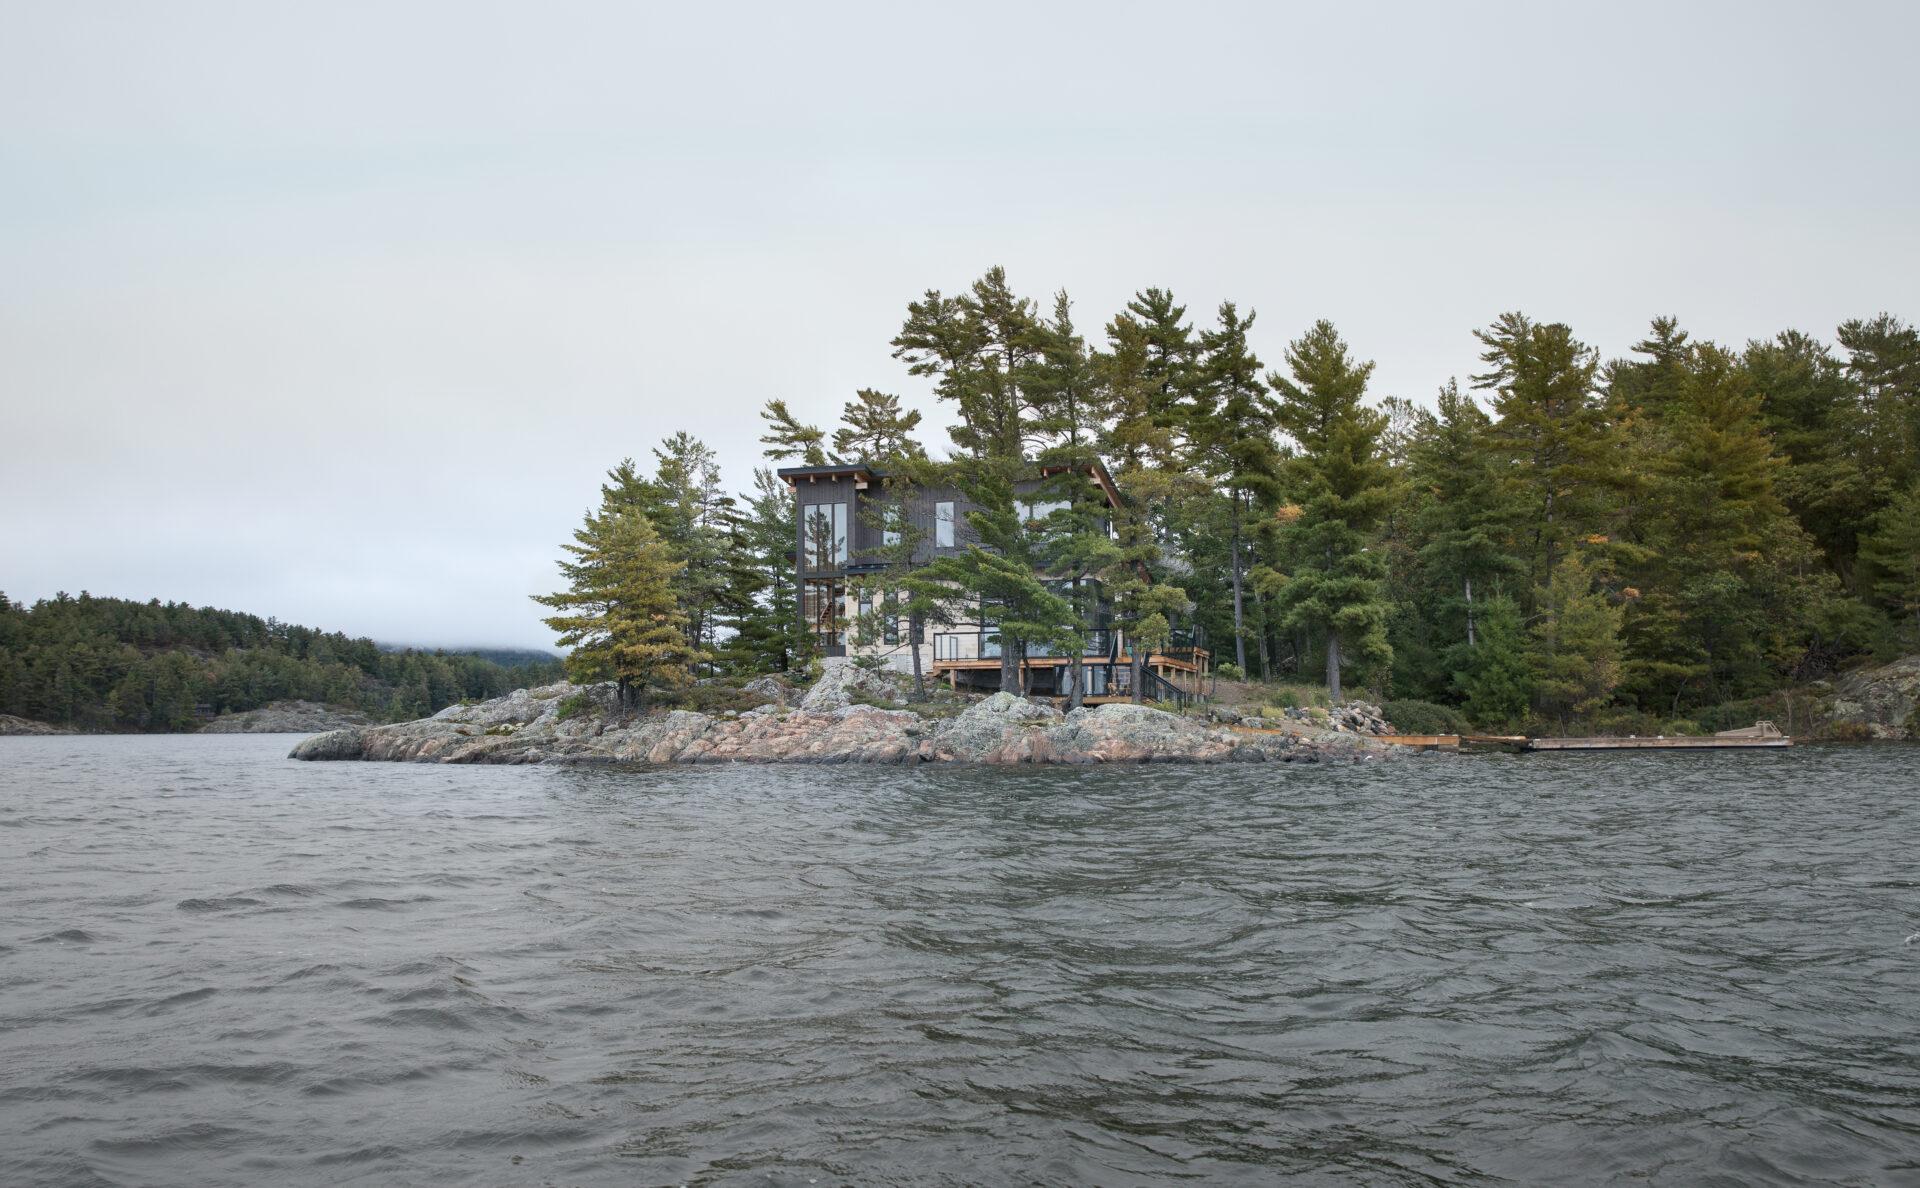 Iroquois Bay Cottage